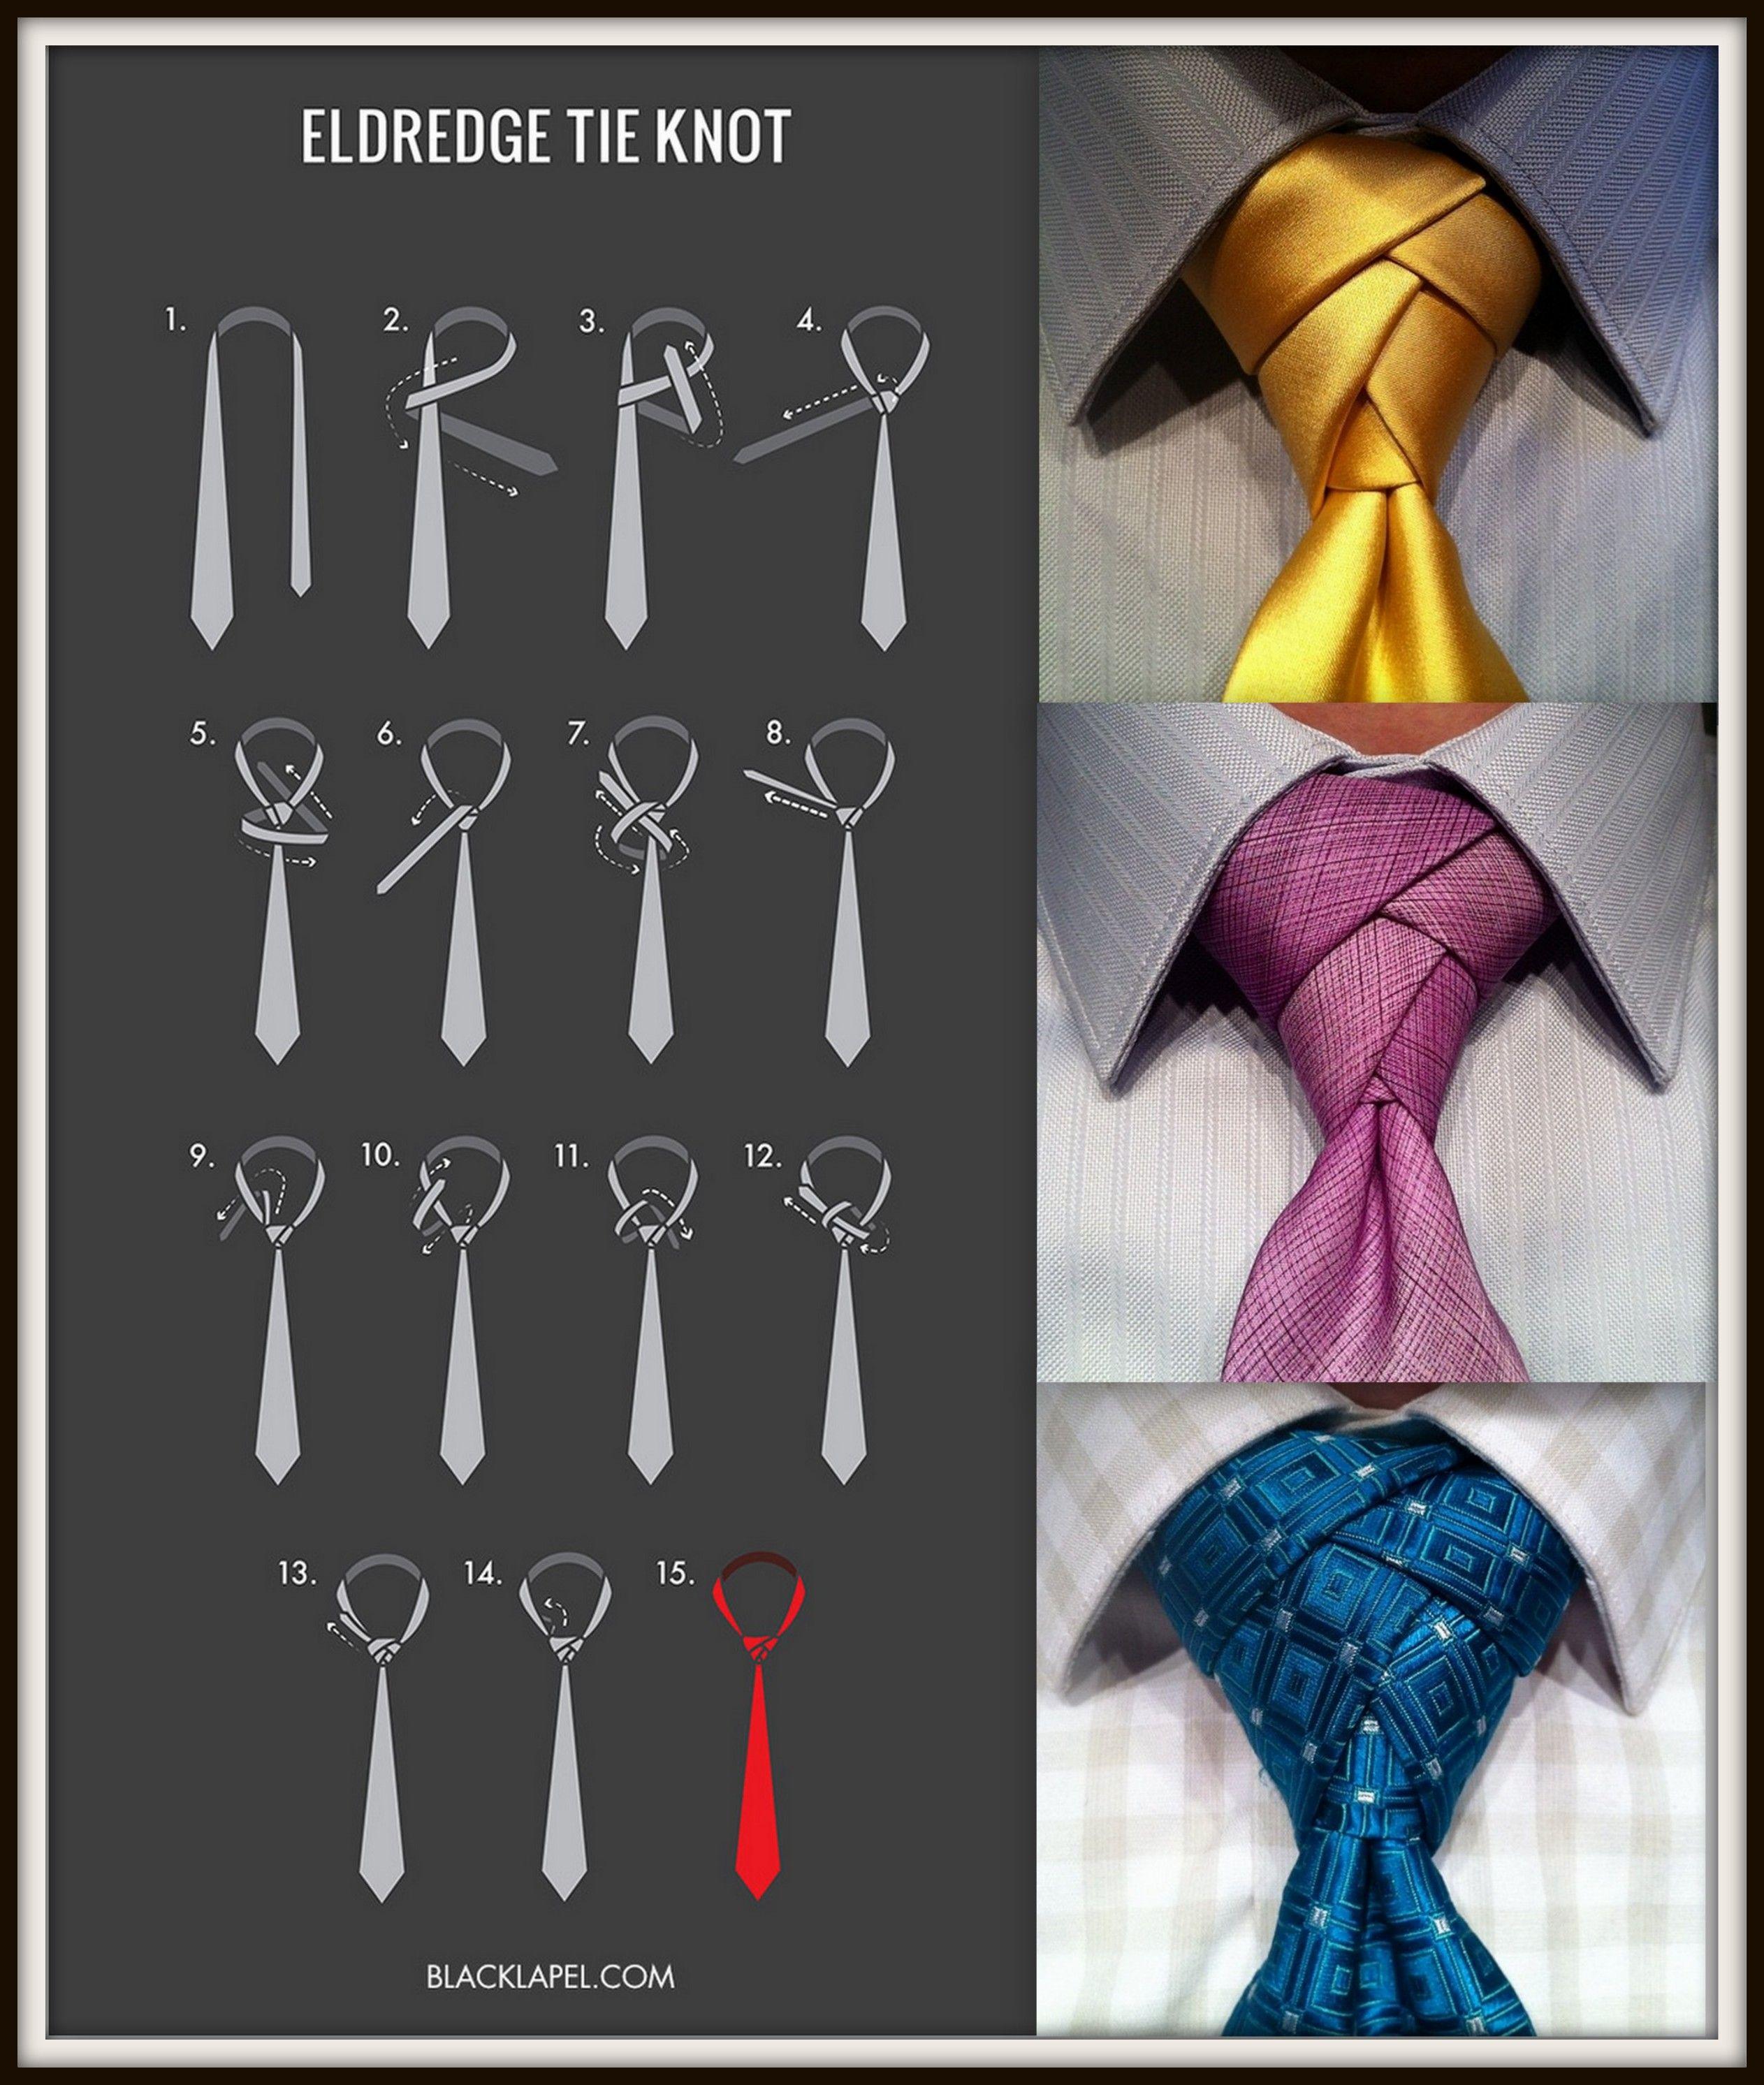 Ns De Gravata Dia A Pinterest Tie Mens Fashion And Knots Diagram Learning Ties Trinity